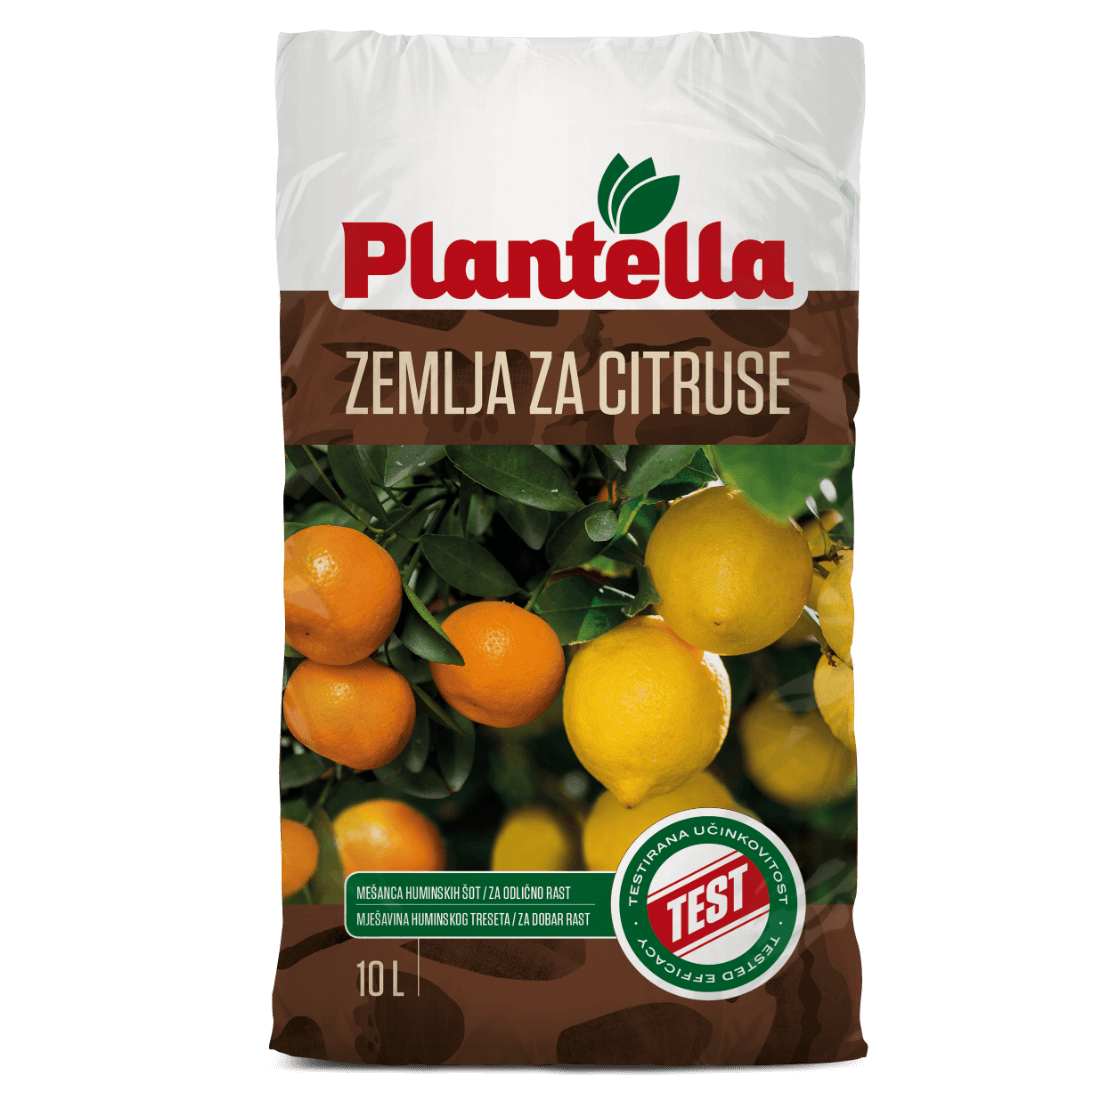 Plantella_Zemlja-citruse_10L_SI-HR